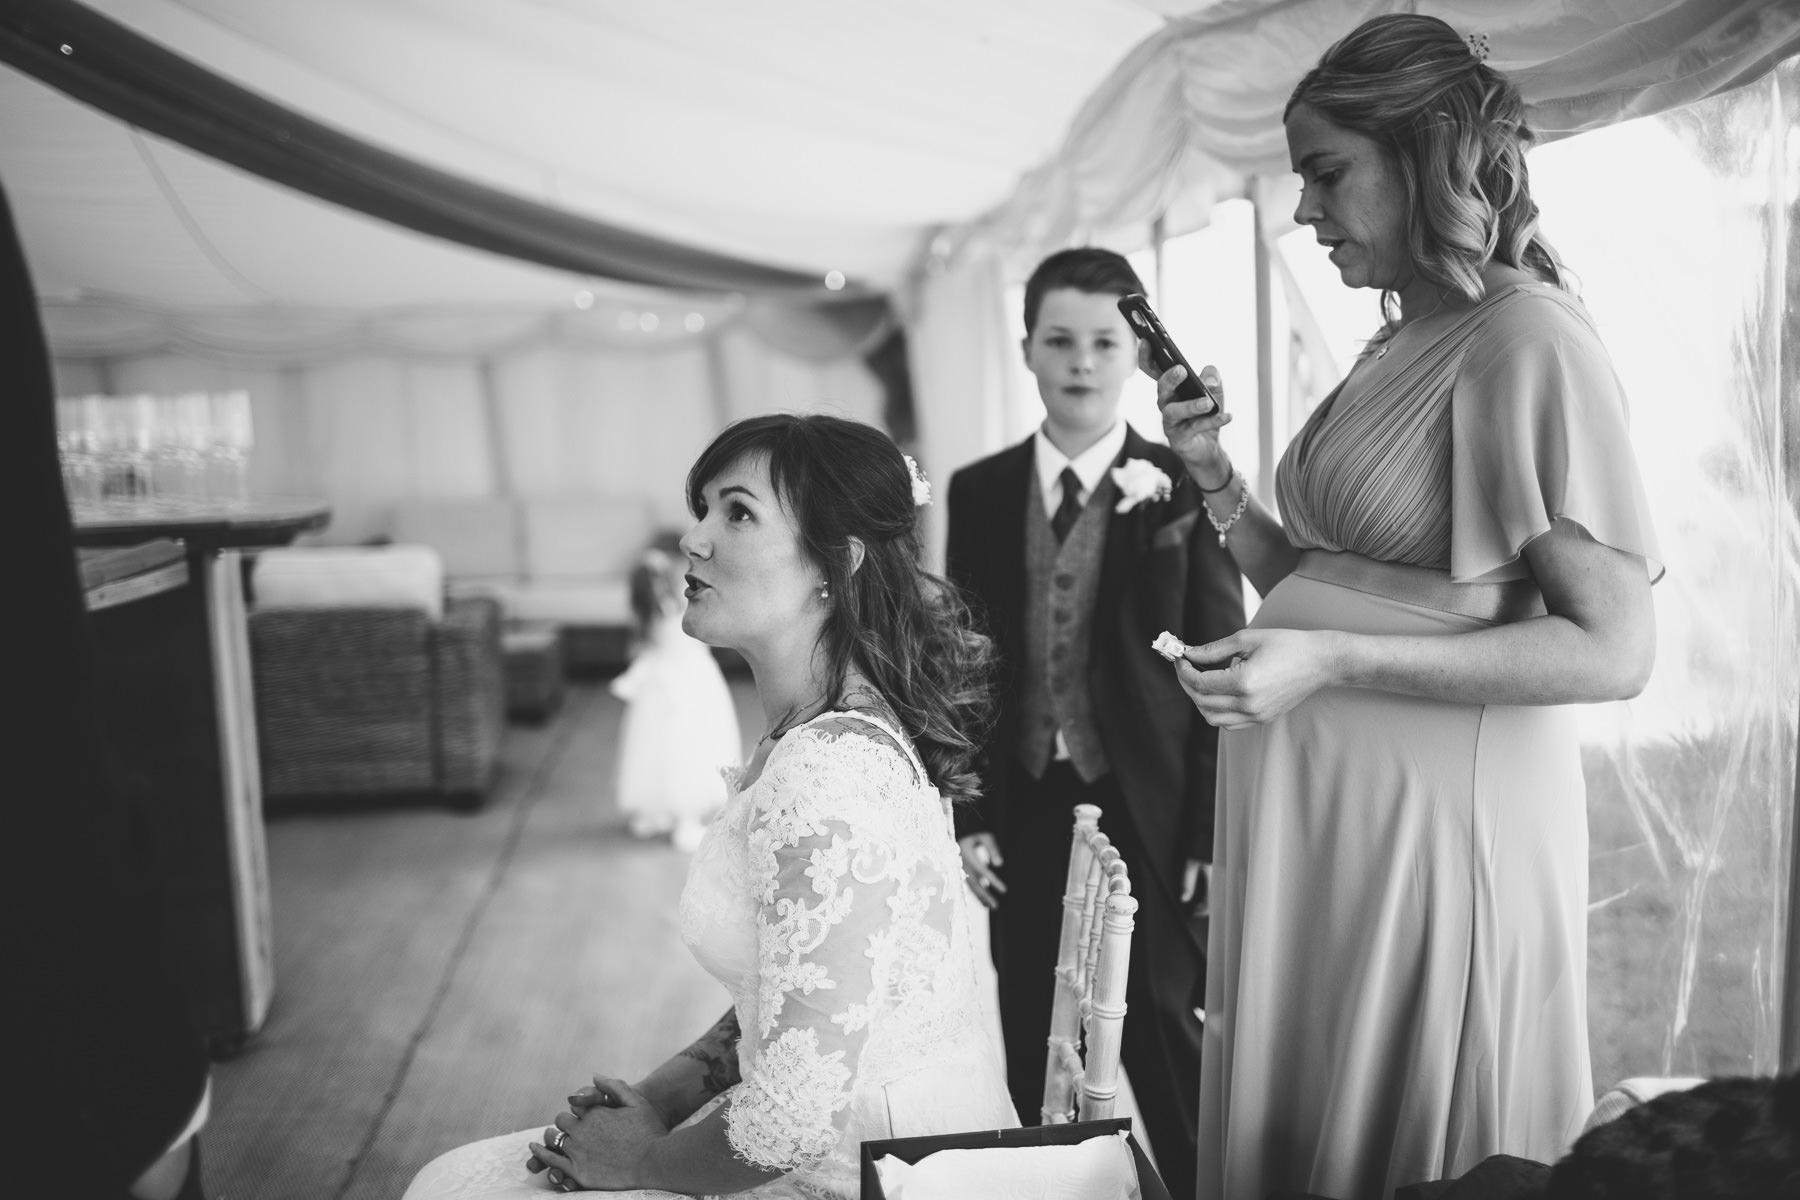 Pamber-Place-wedding-photography-basingstoke-hampshire-170